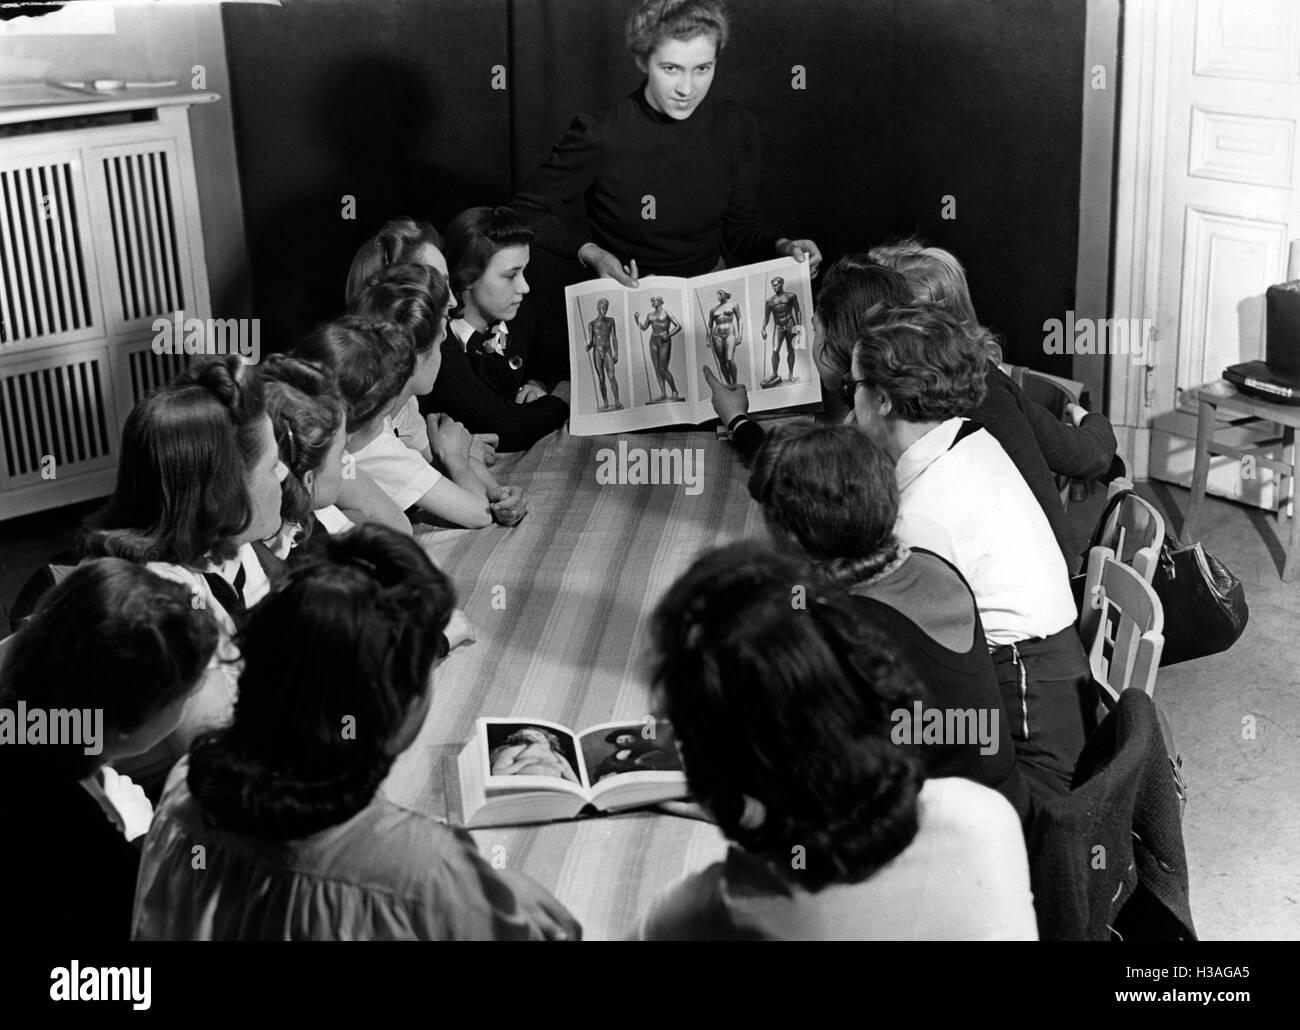 Social evening at the BDM-Werk Glaube und Schoenheit (BDM-Work, Faith and Beauty Society), Berlin 1941 - Stock Image